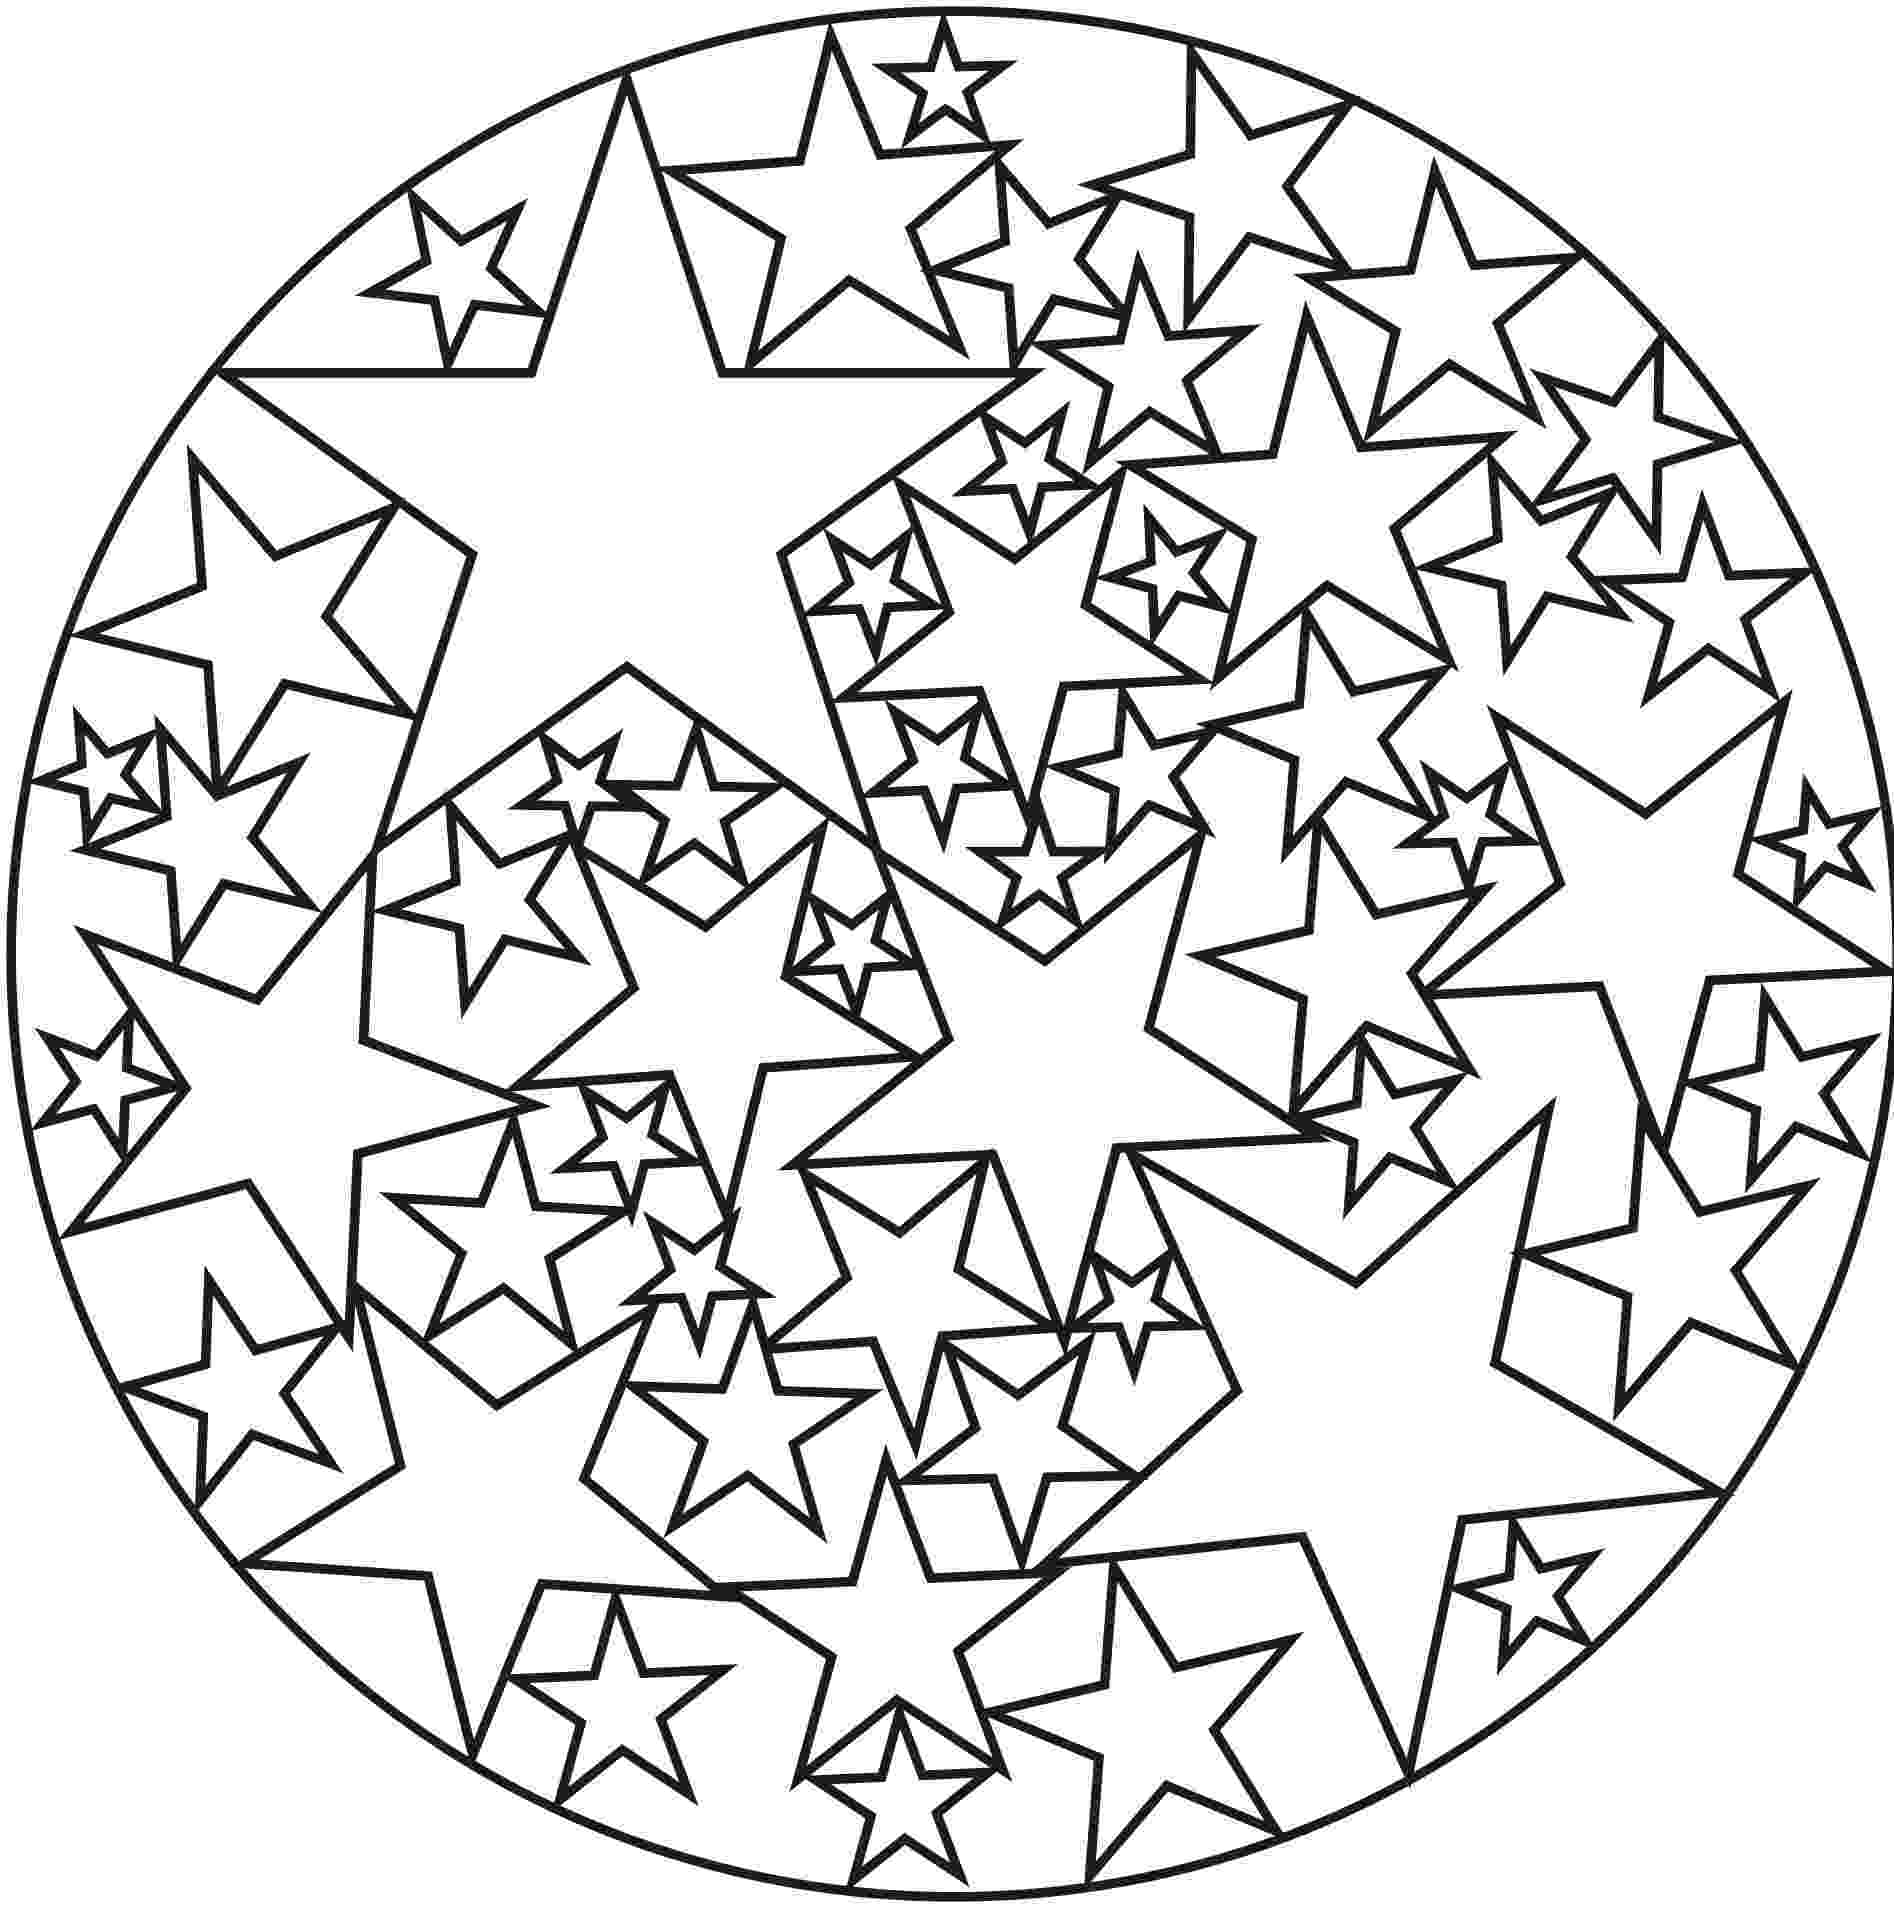 free mandalas for kids mandalas free to color for kids mandalas kids coloring pages free kids mandalas for